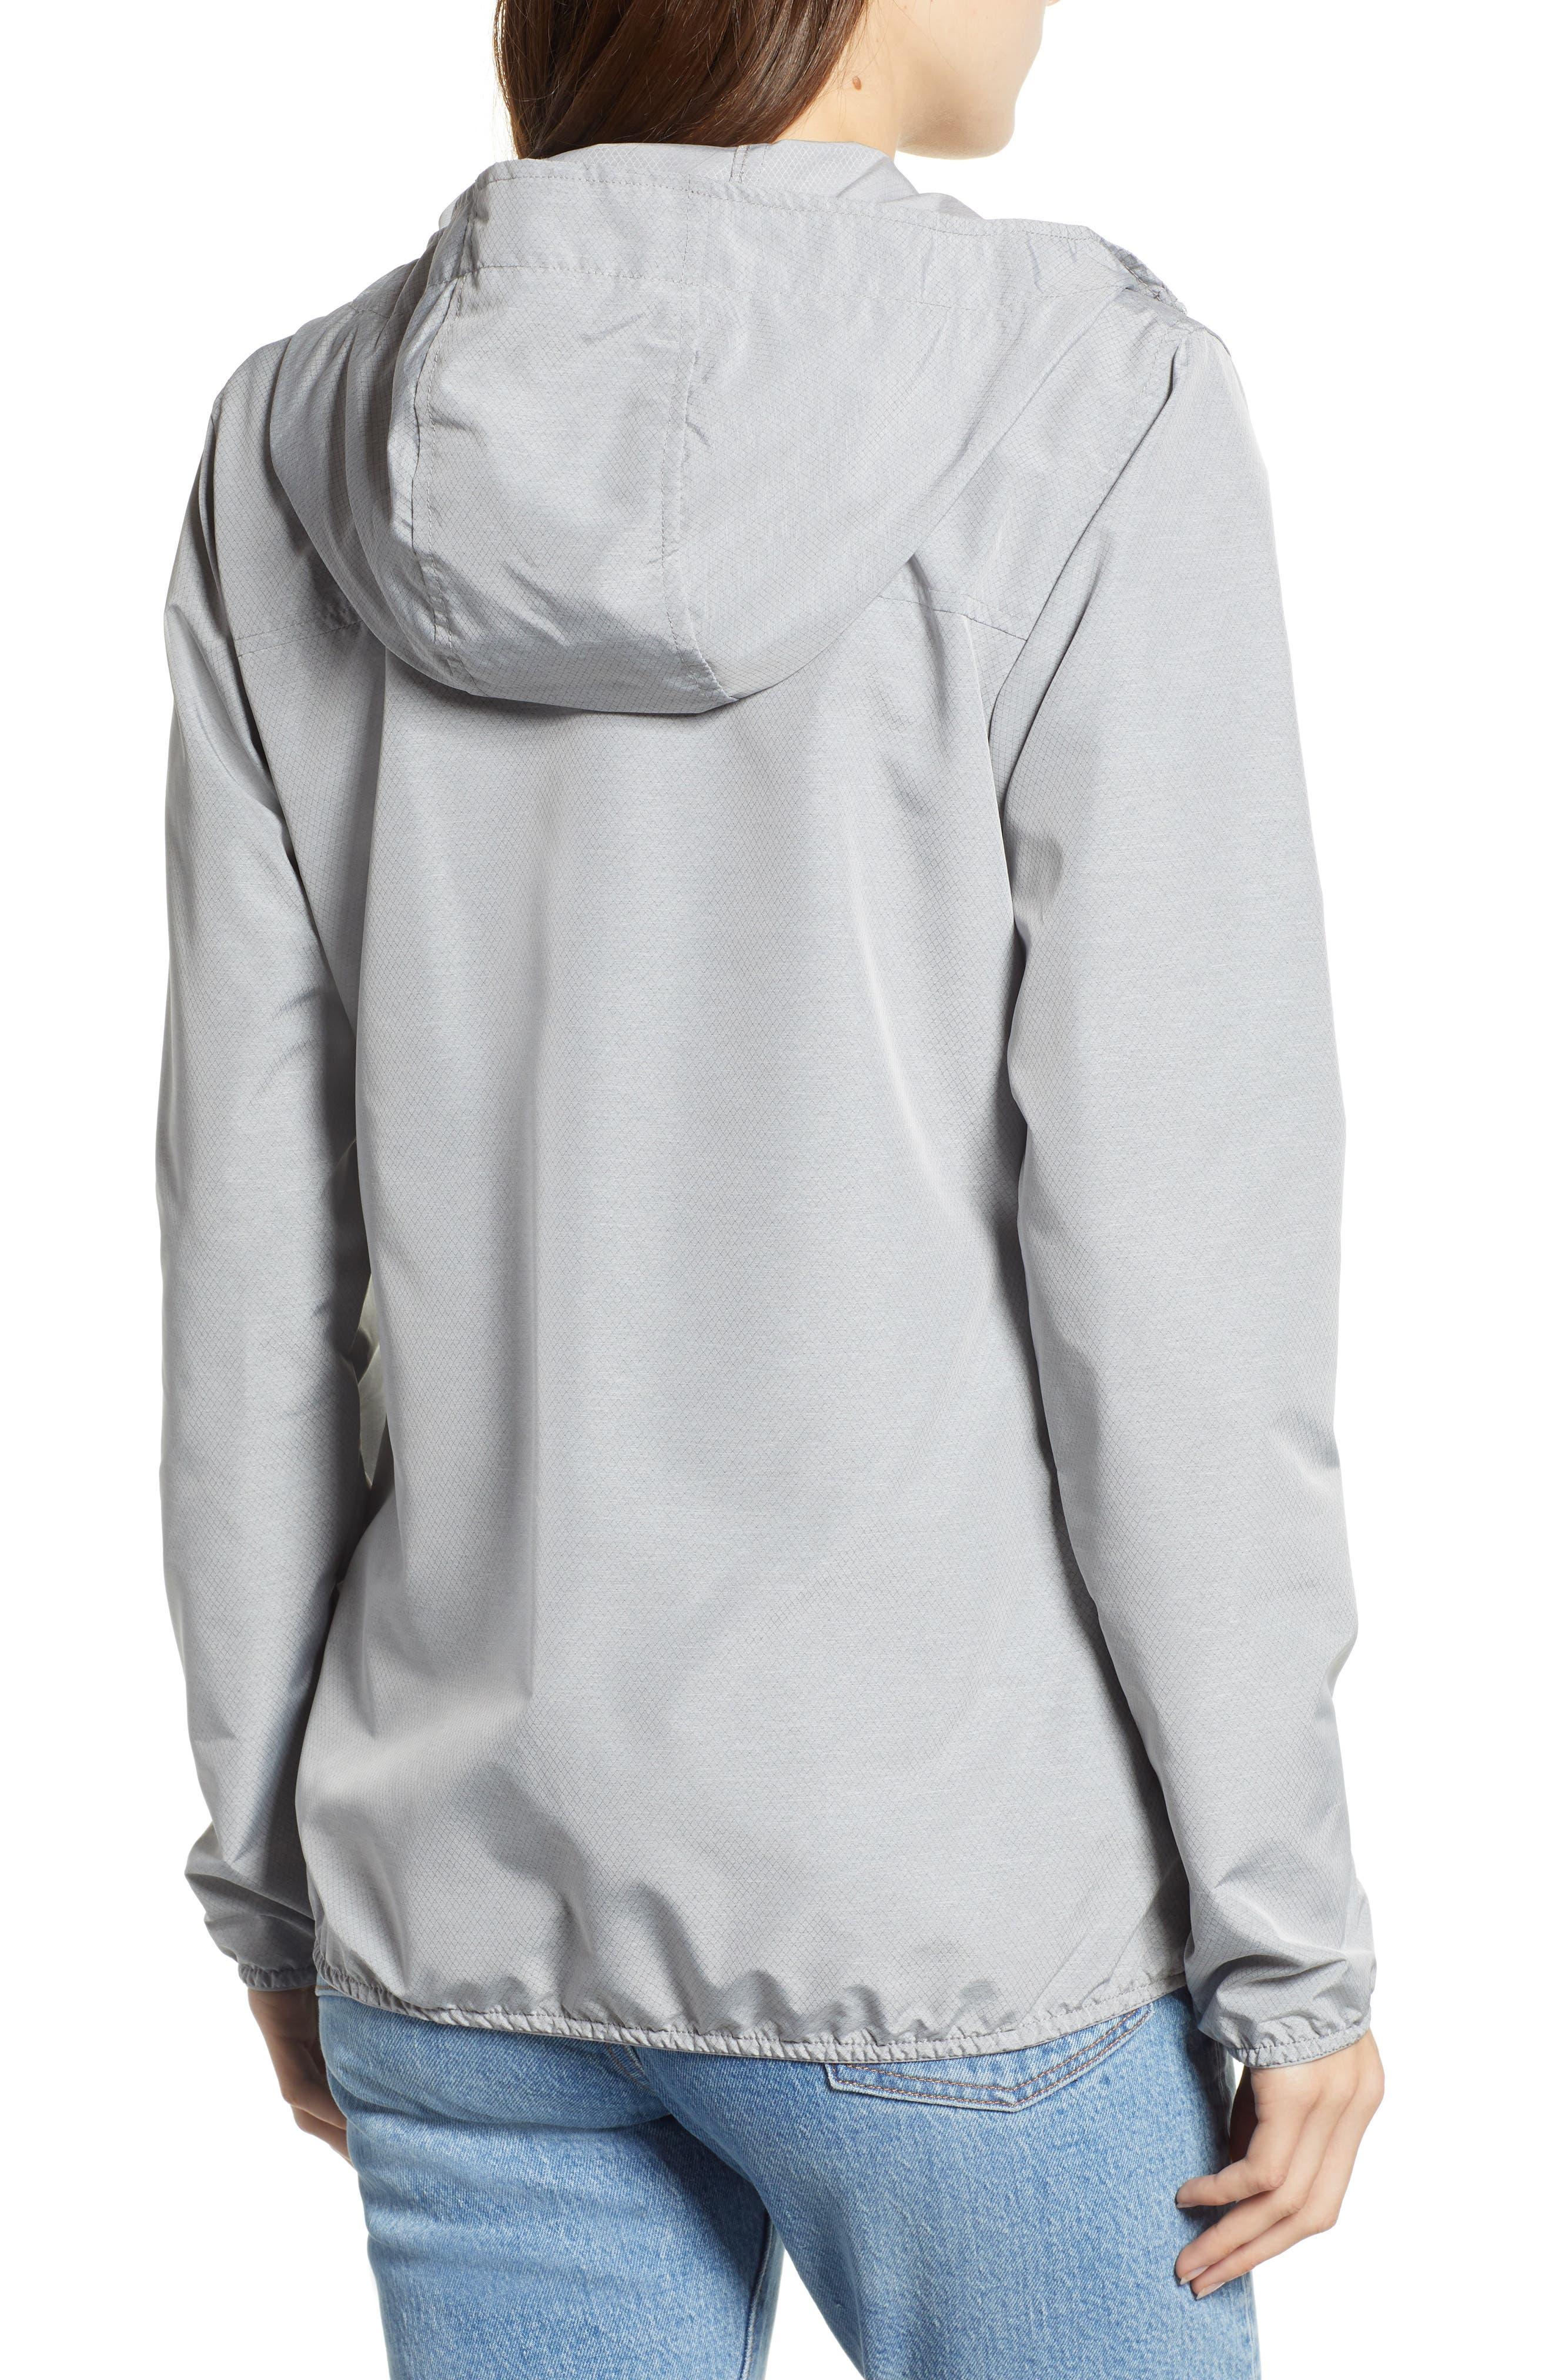 oyage Wind Hooded Jacket,                             Alternate thumbnail 2, color,                             LIGHT GREY CROSSHATCH